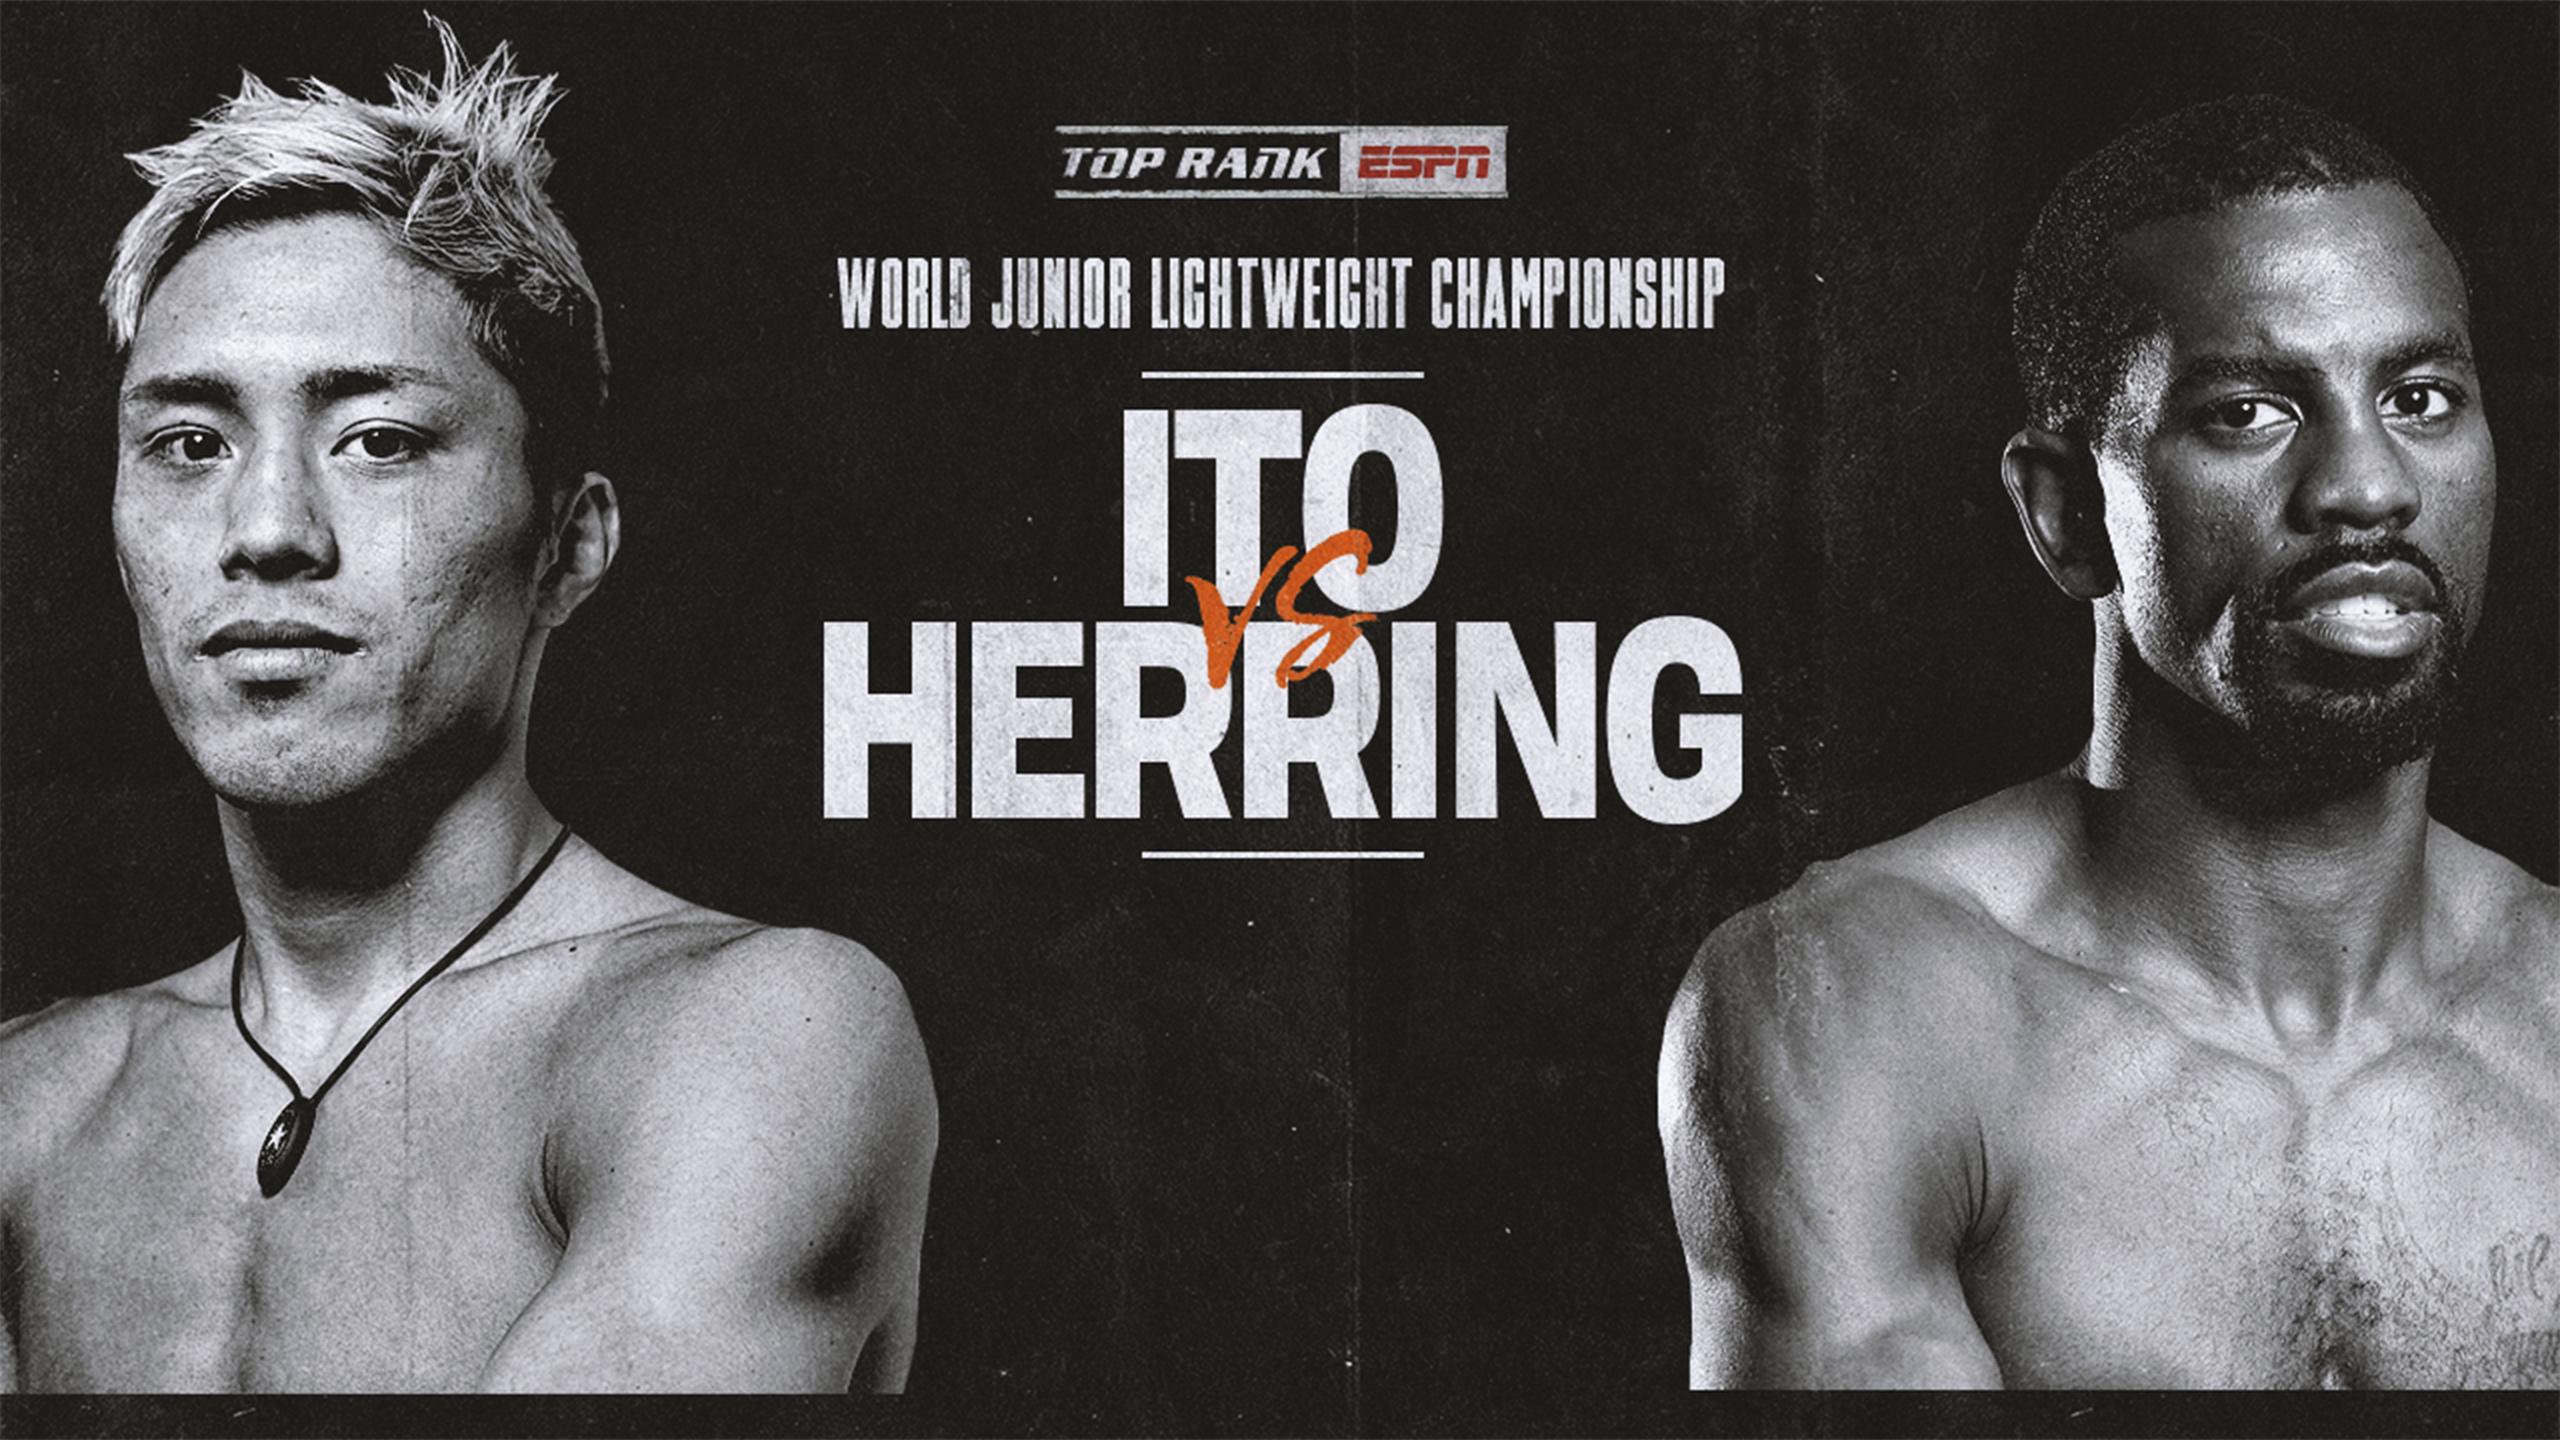 Masayuki Ito vs. Jamel Herring (re-air)